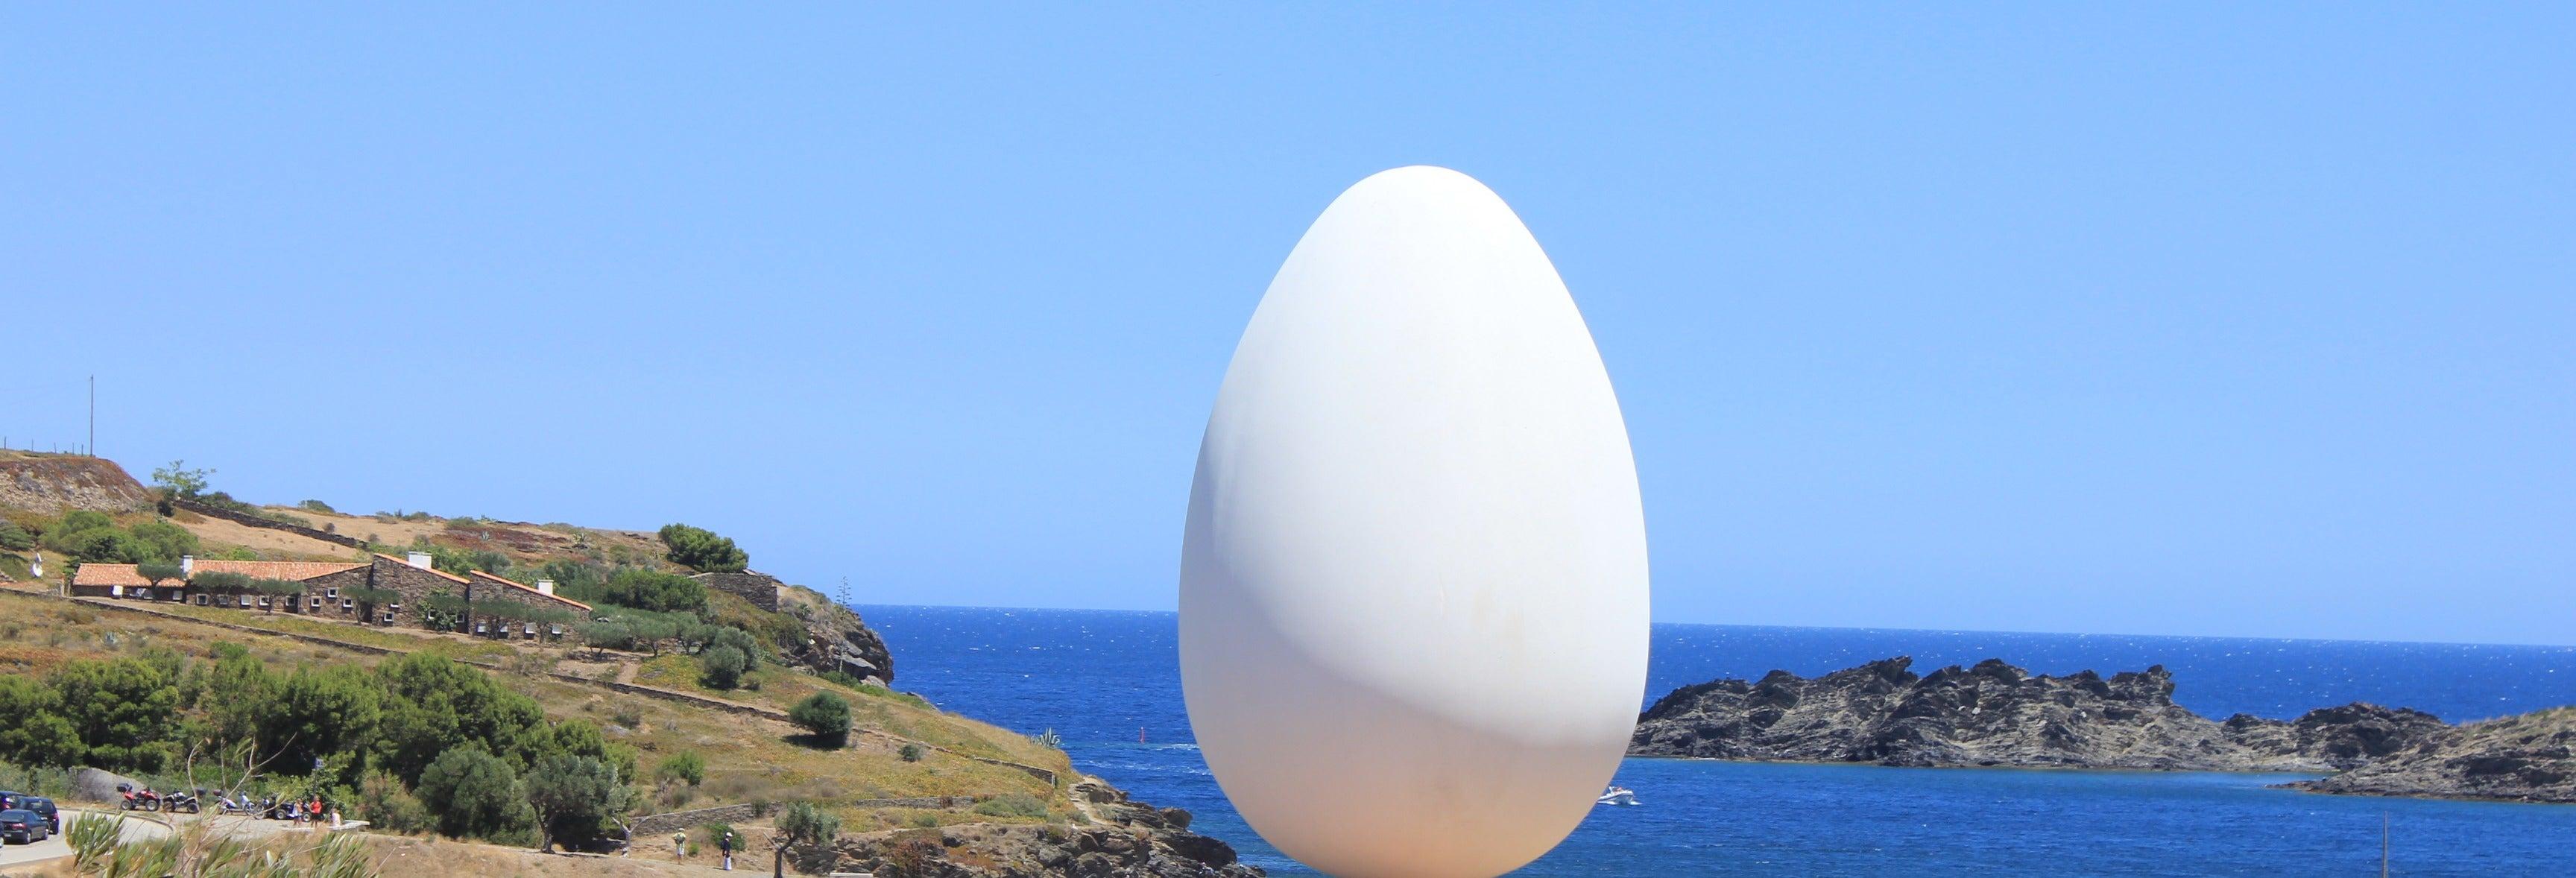 Tour por Gerona + Museo Dalí de Figueras